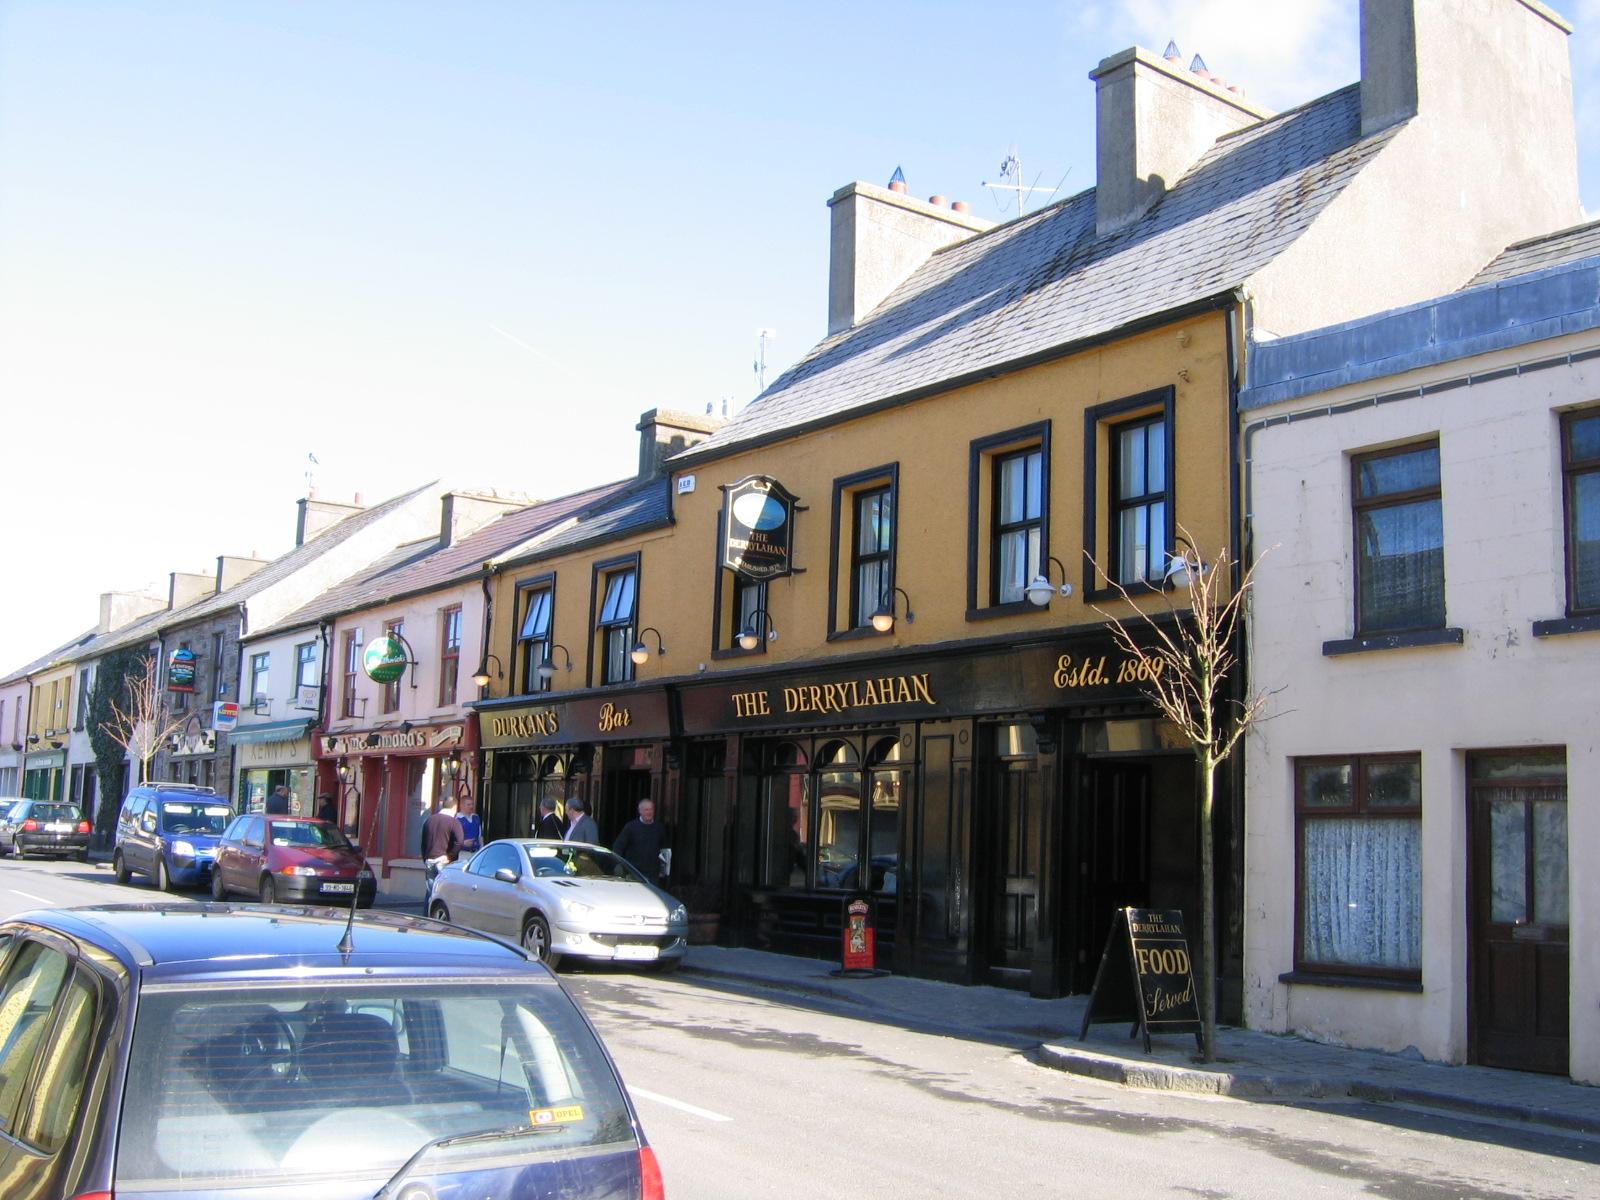 1790 in Ireland